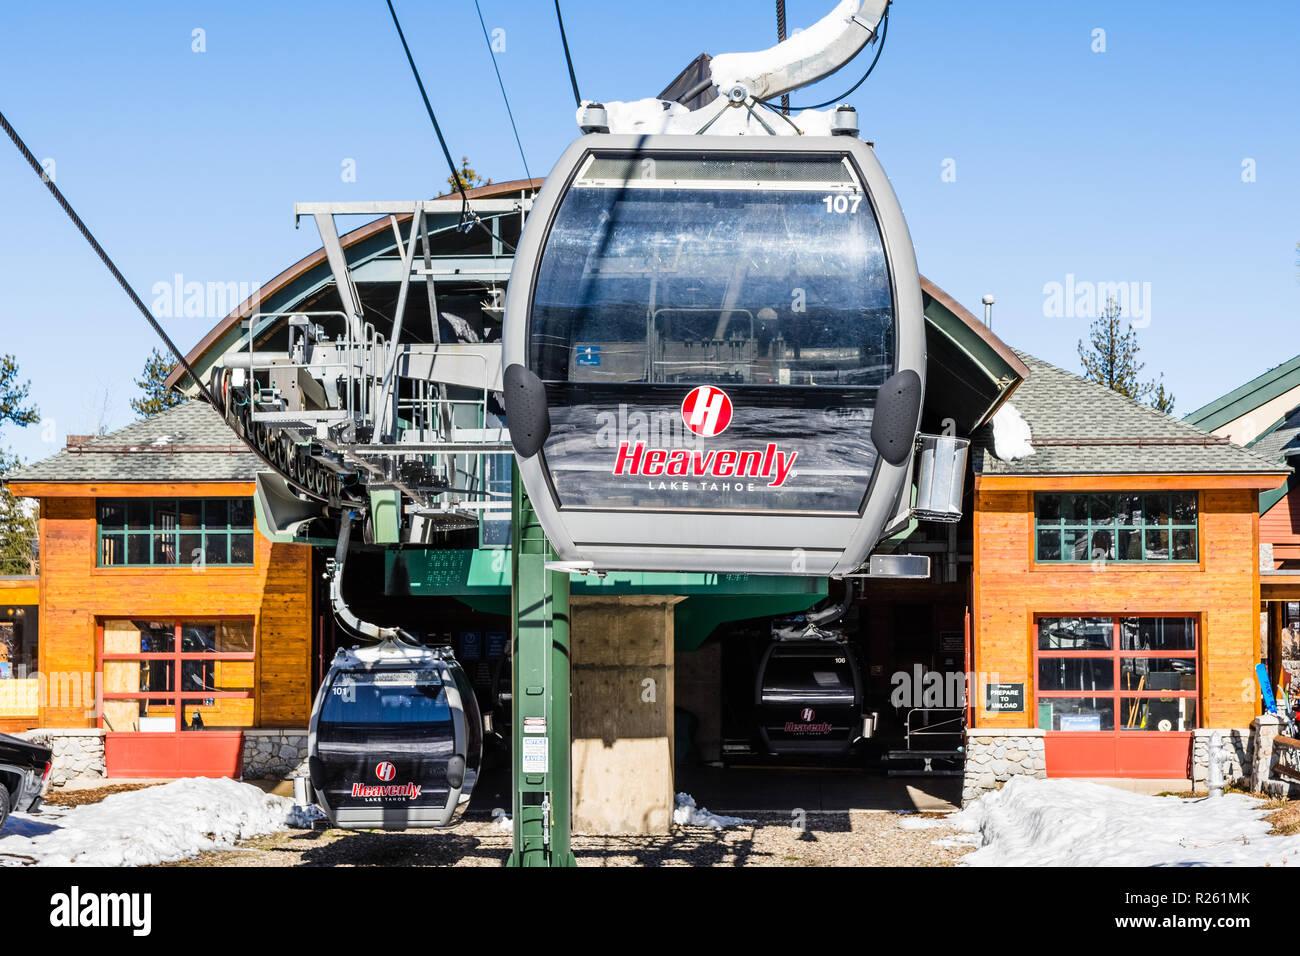 march 23, 2018 south lake tahoe / ca / usa - heavenly ski resort